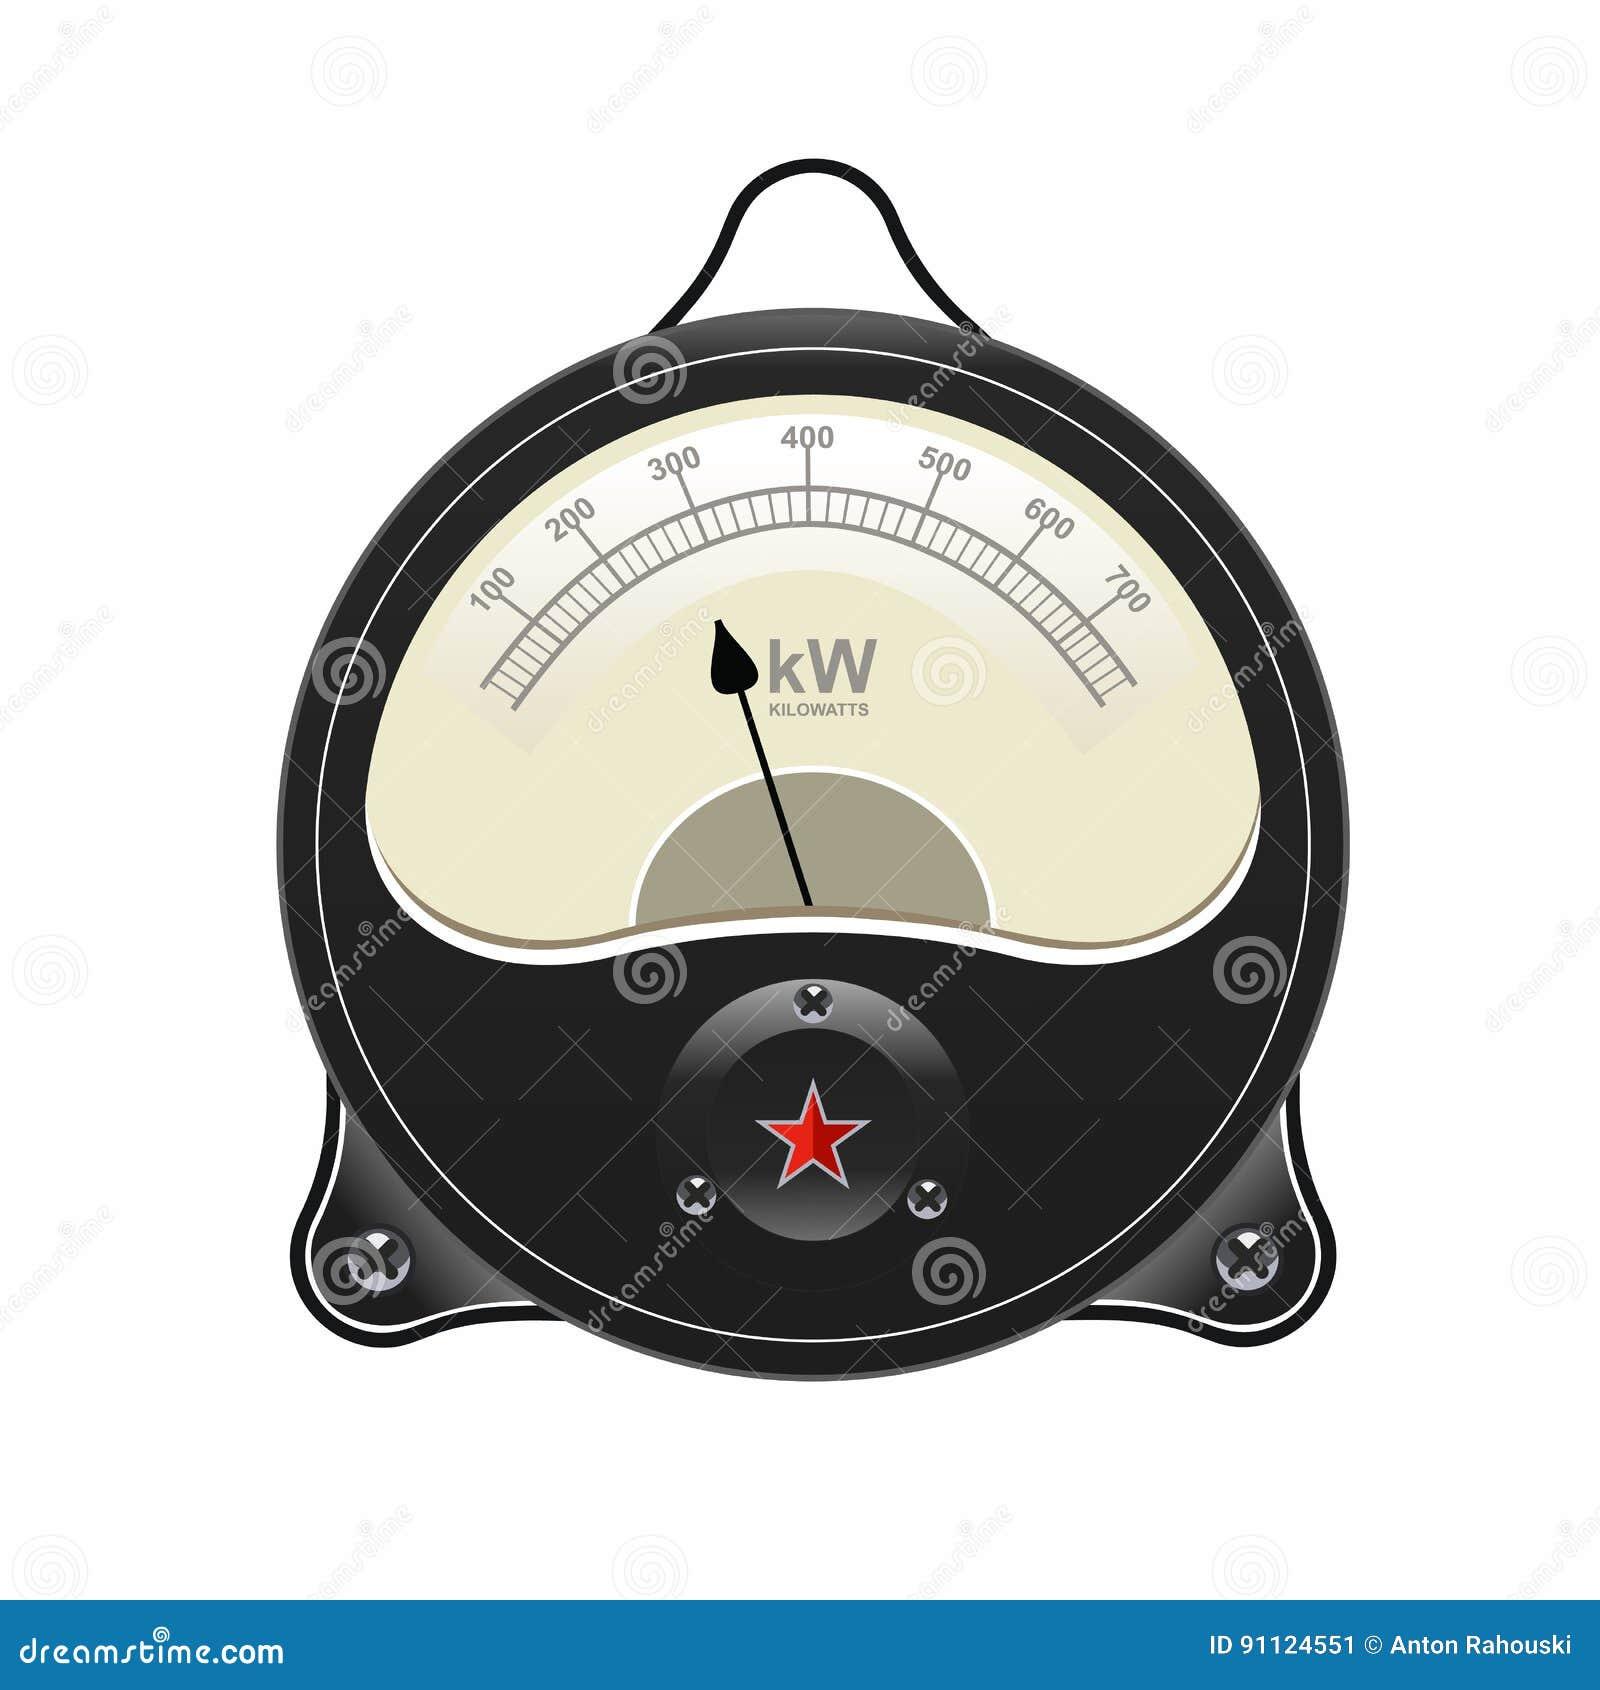 Analog Meter Background : Realistic electronic analog vu signal meter stock